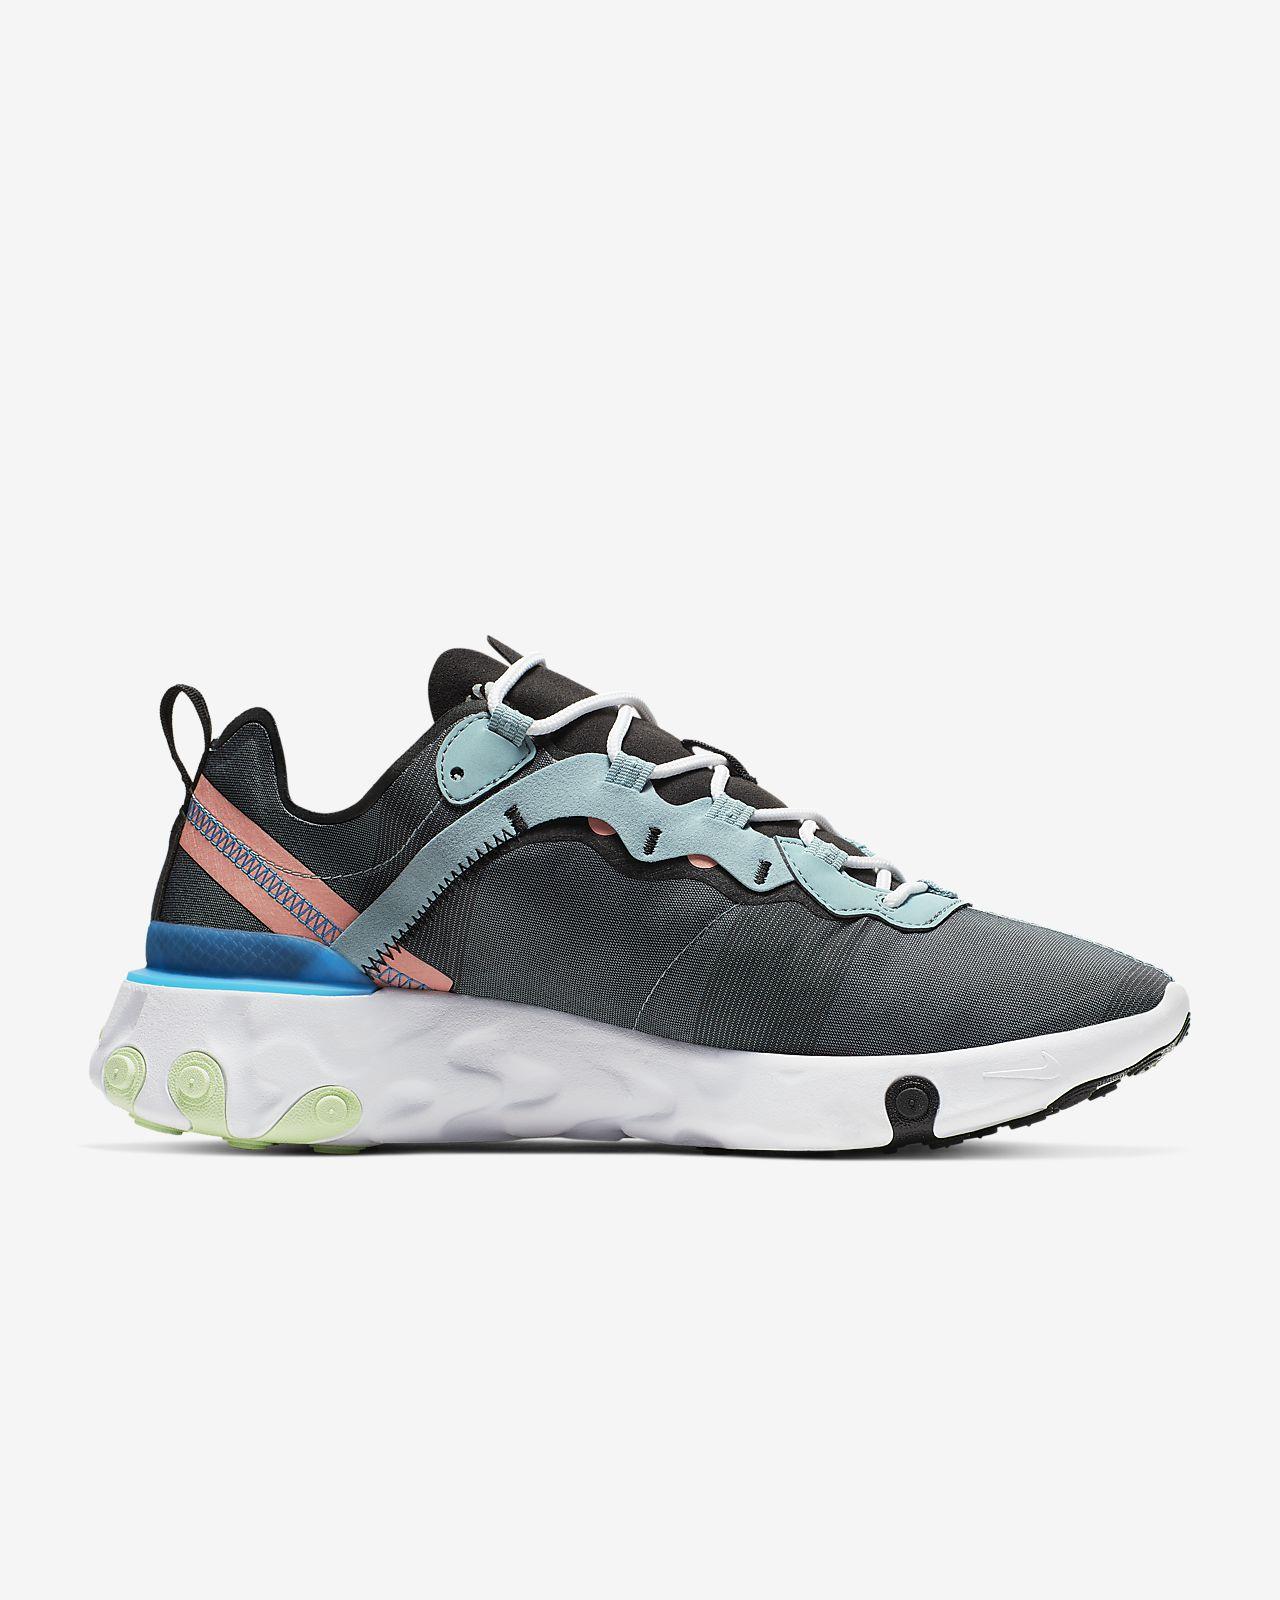 9de9a463bc0 Nike React Element 55 Men's Shoe. Nike.com